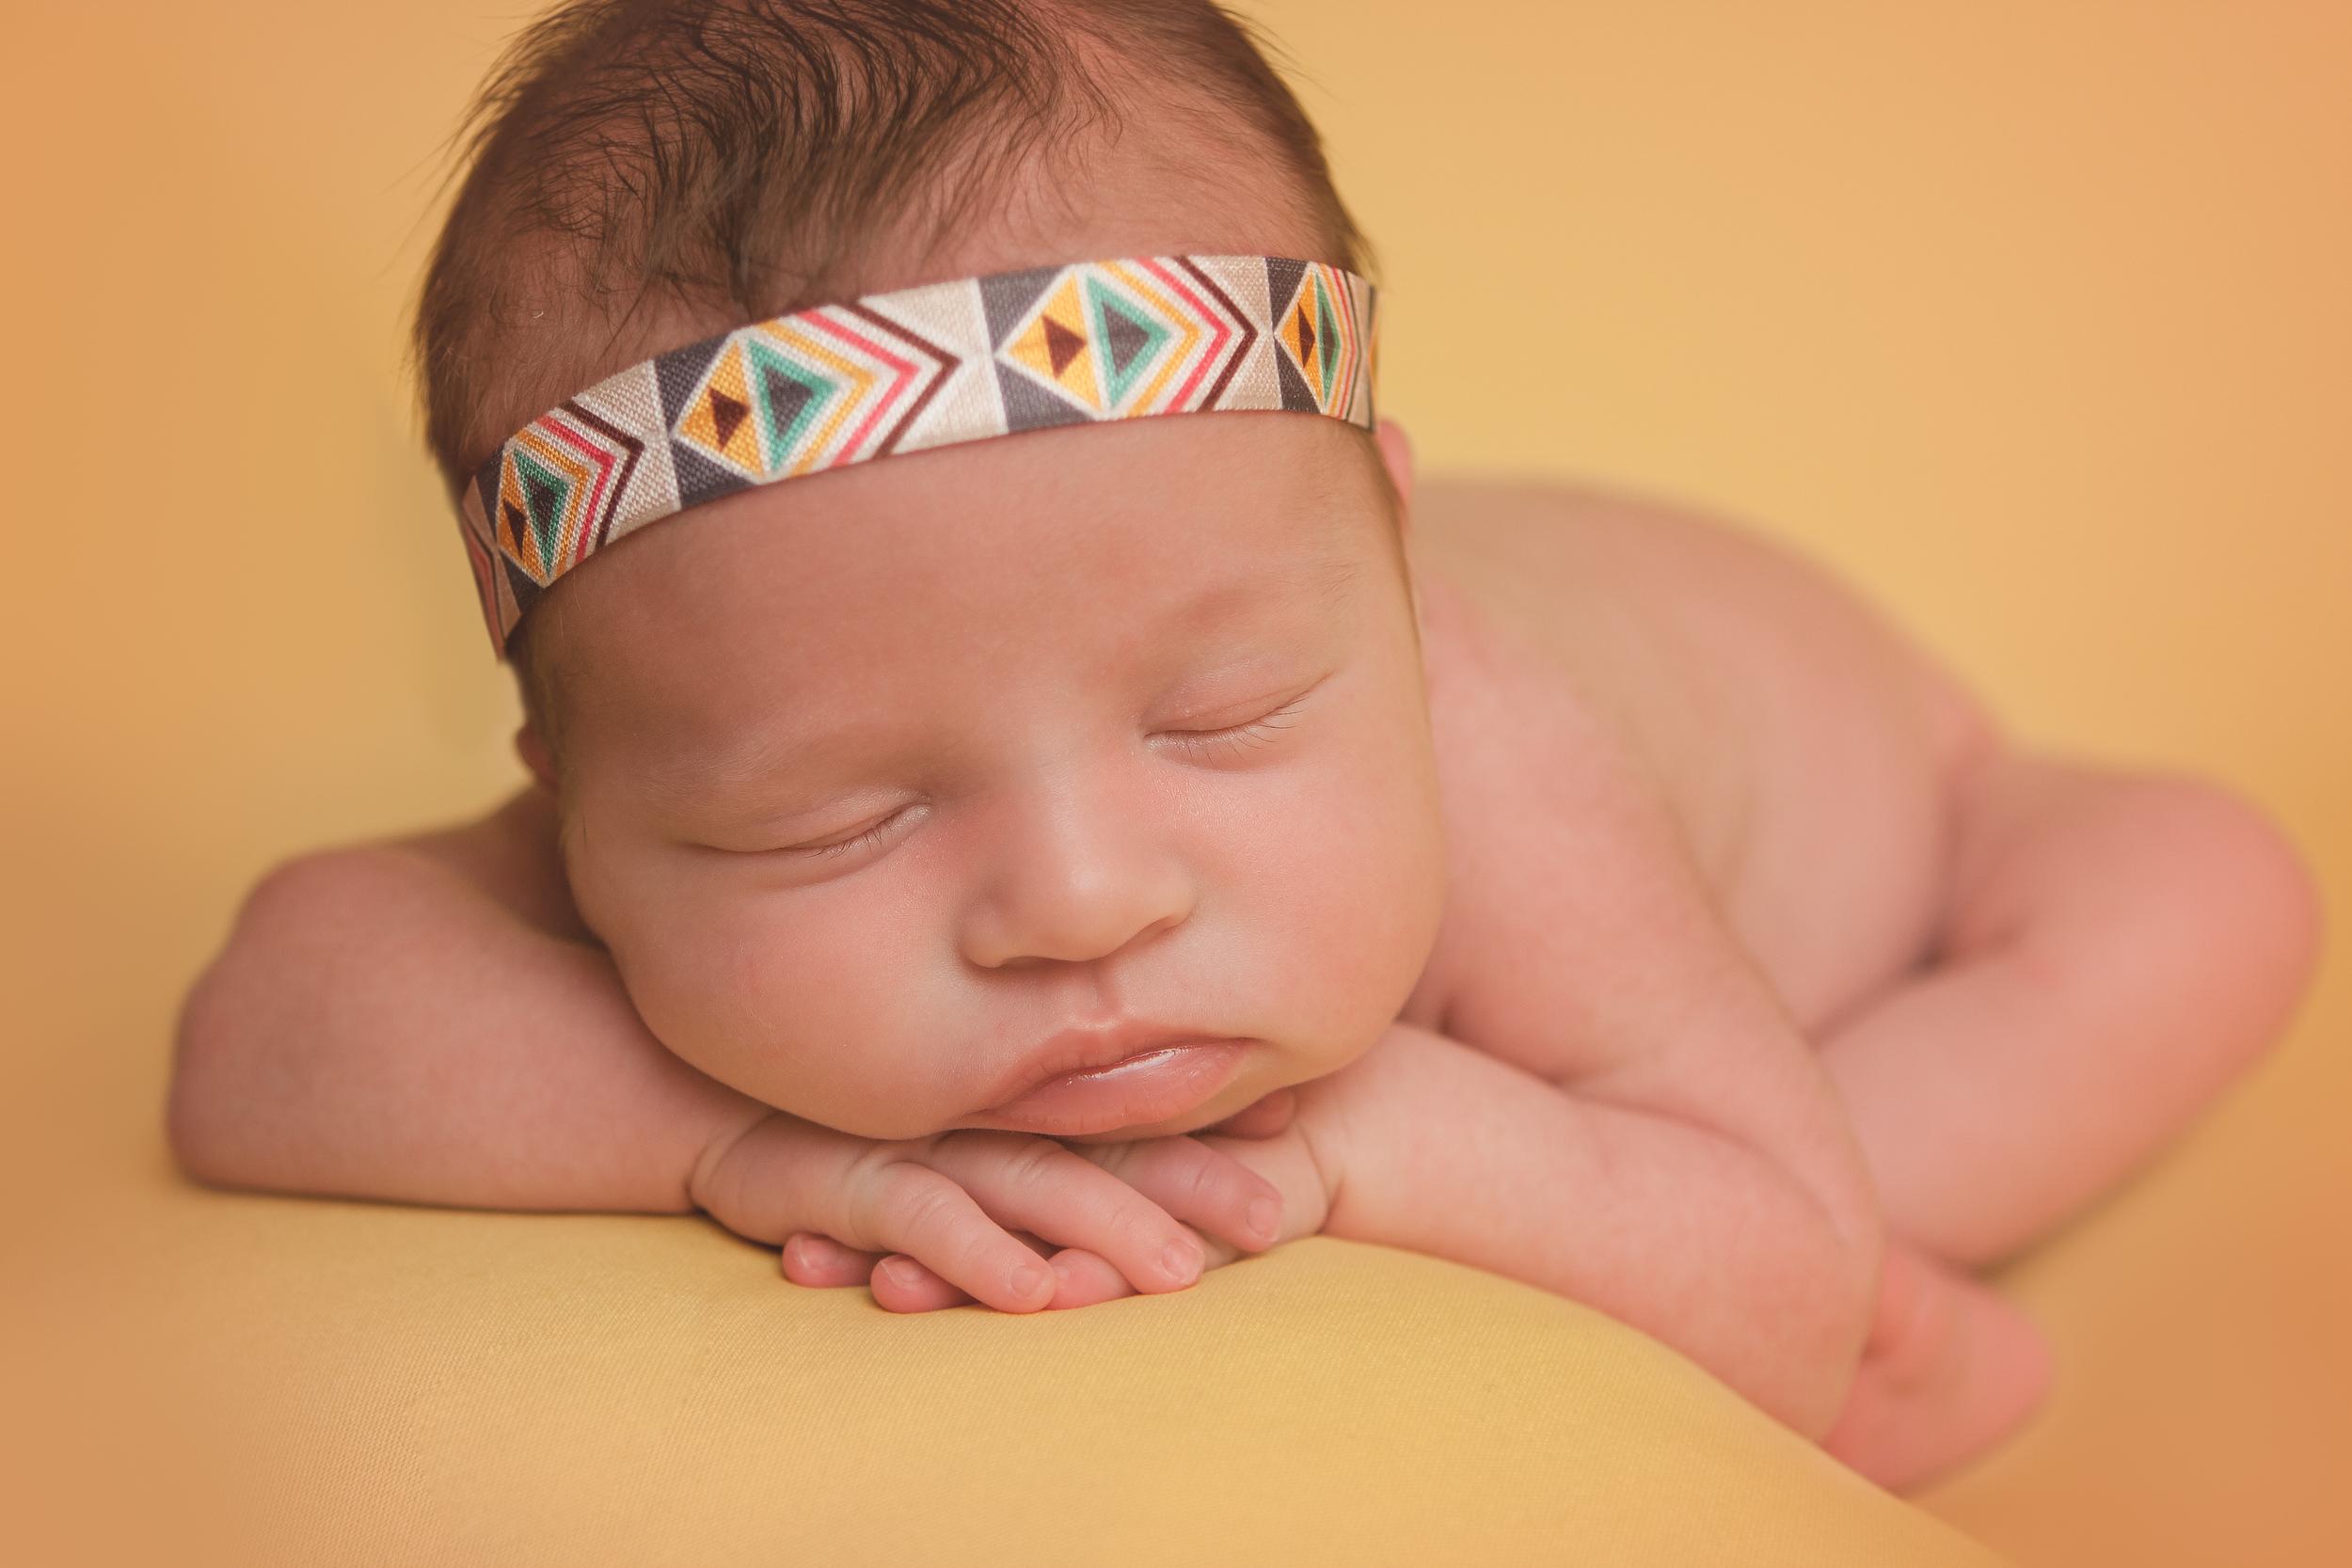 Newborn baby girl sleeping pose, bohemian headband, yellow blanket fabric backdrop, head chin on hands bean bag pose.